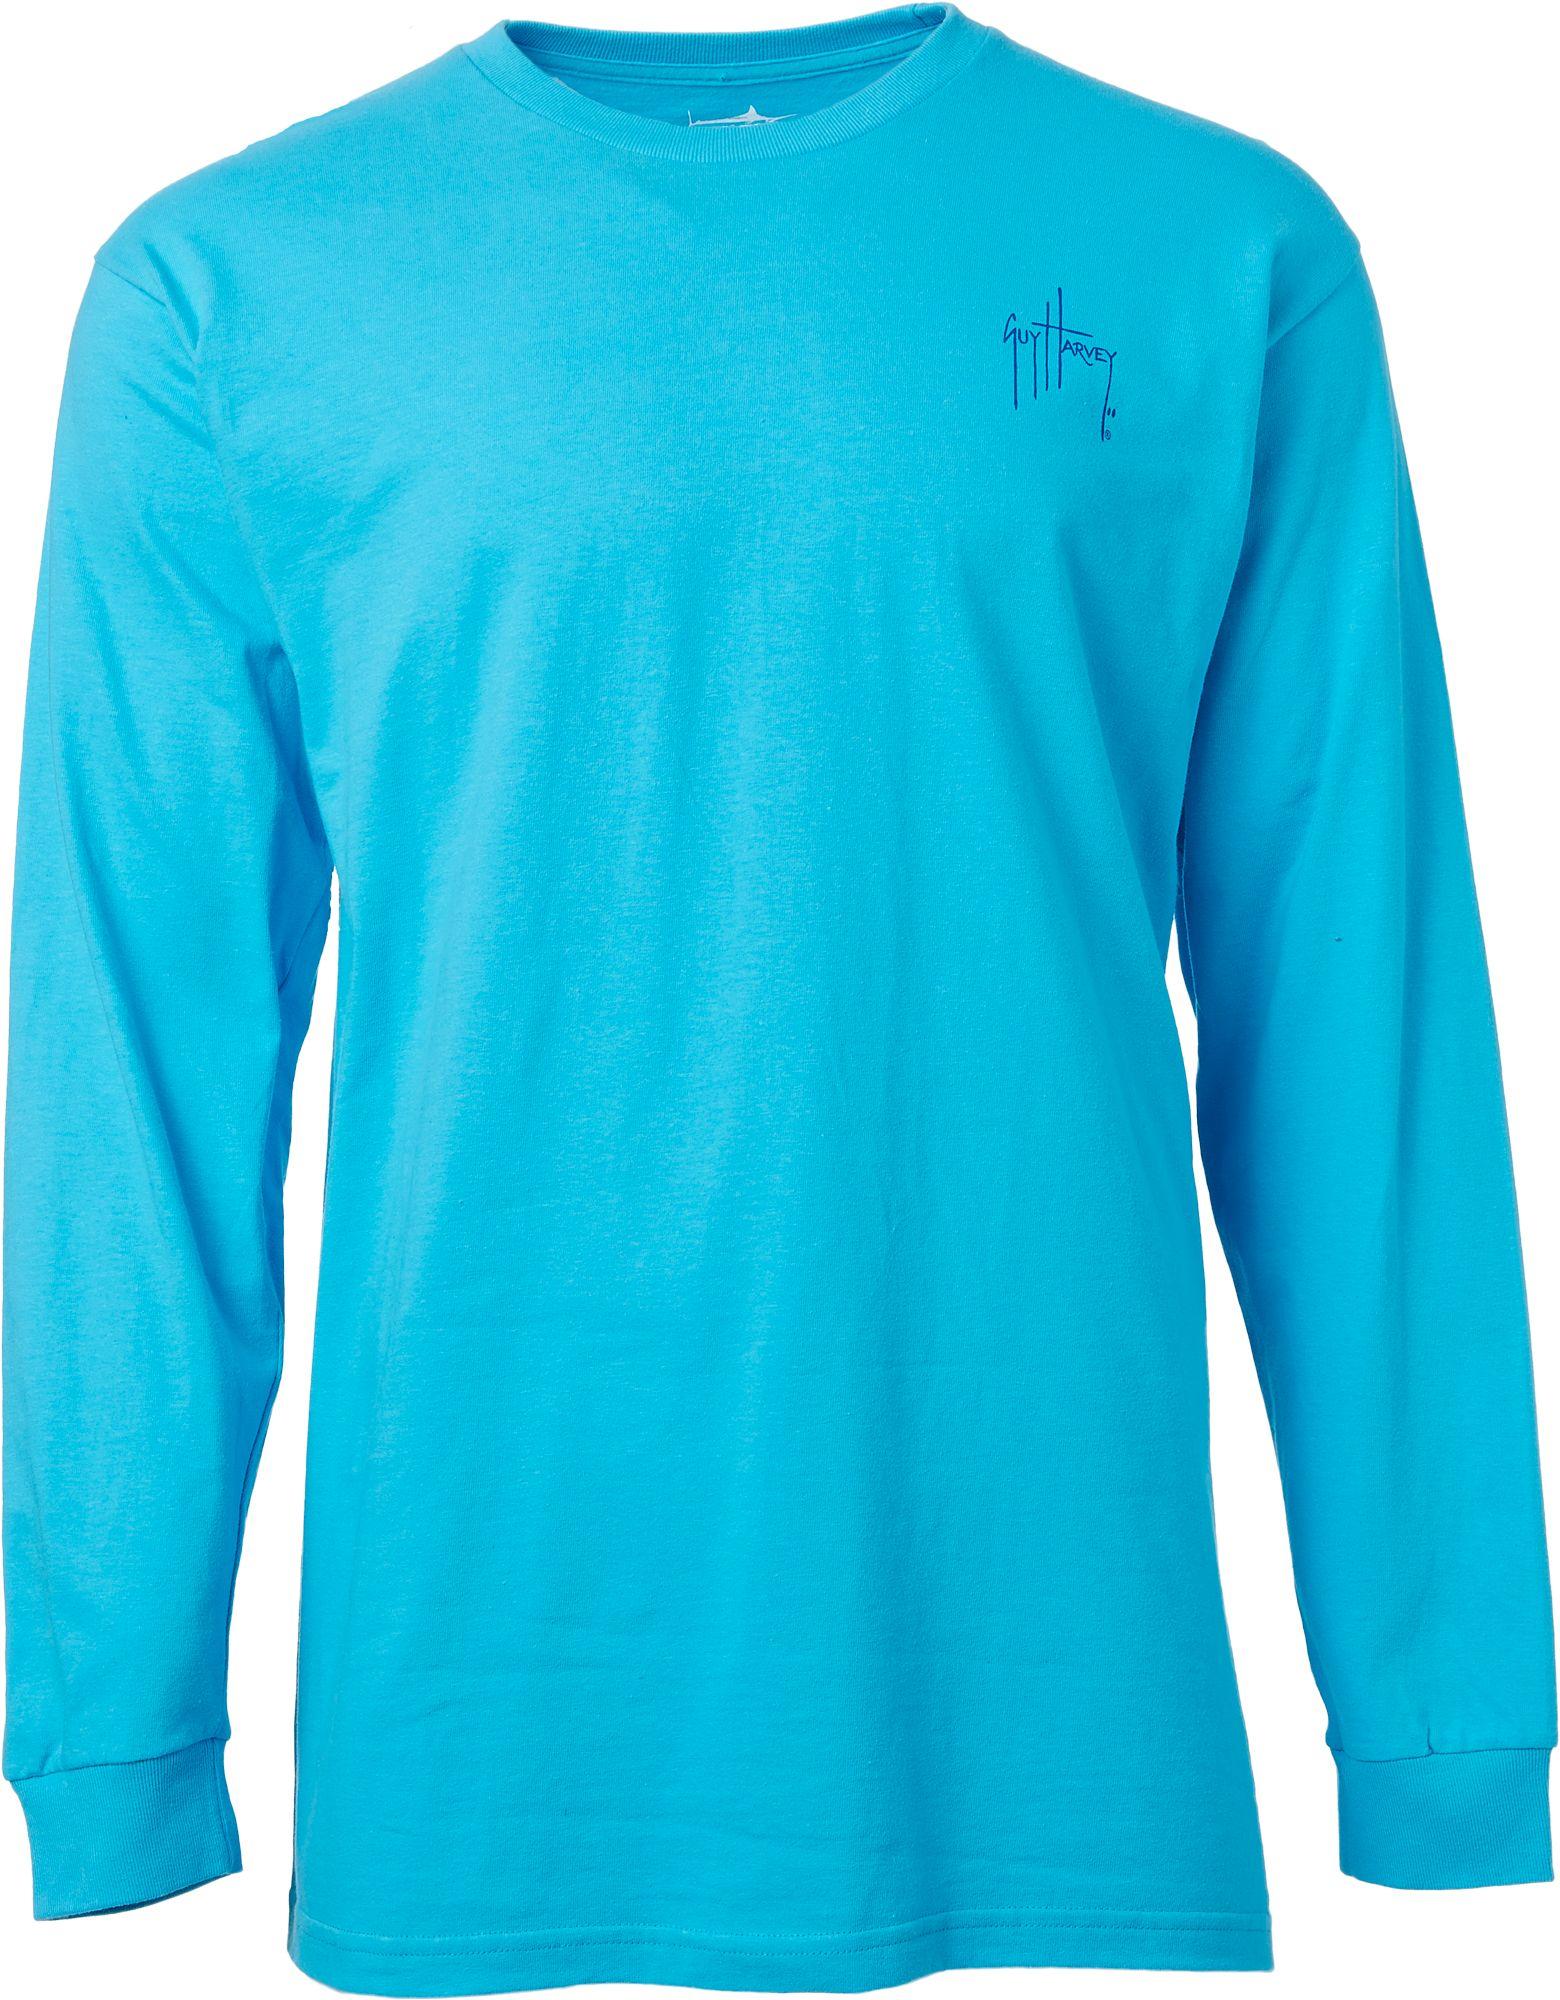 7185196a Guy Harvey Men's GH Logo Long Sleeve Tee | DICK'S Sporting ...